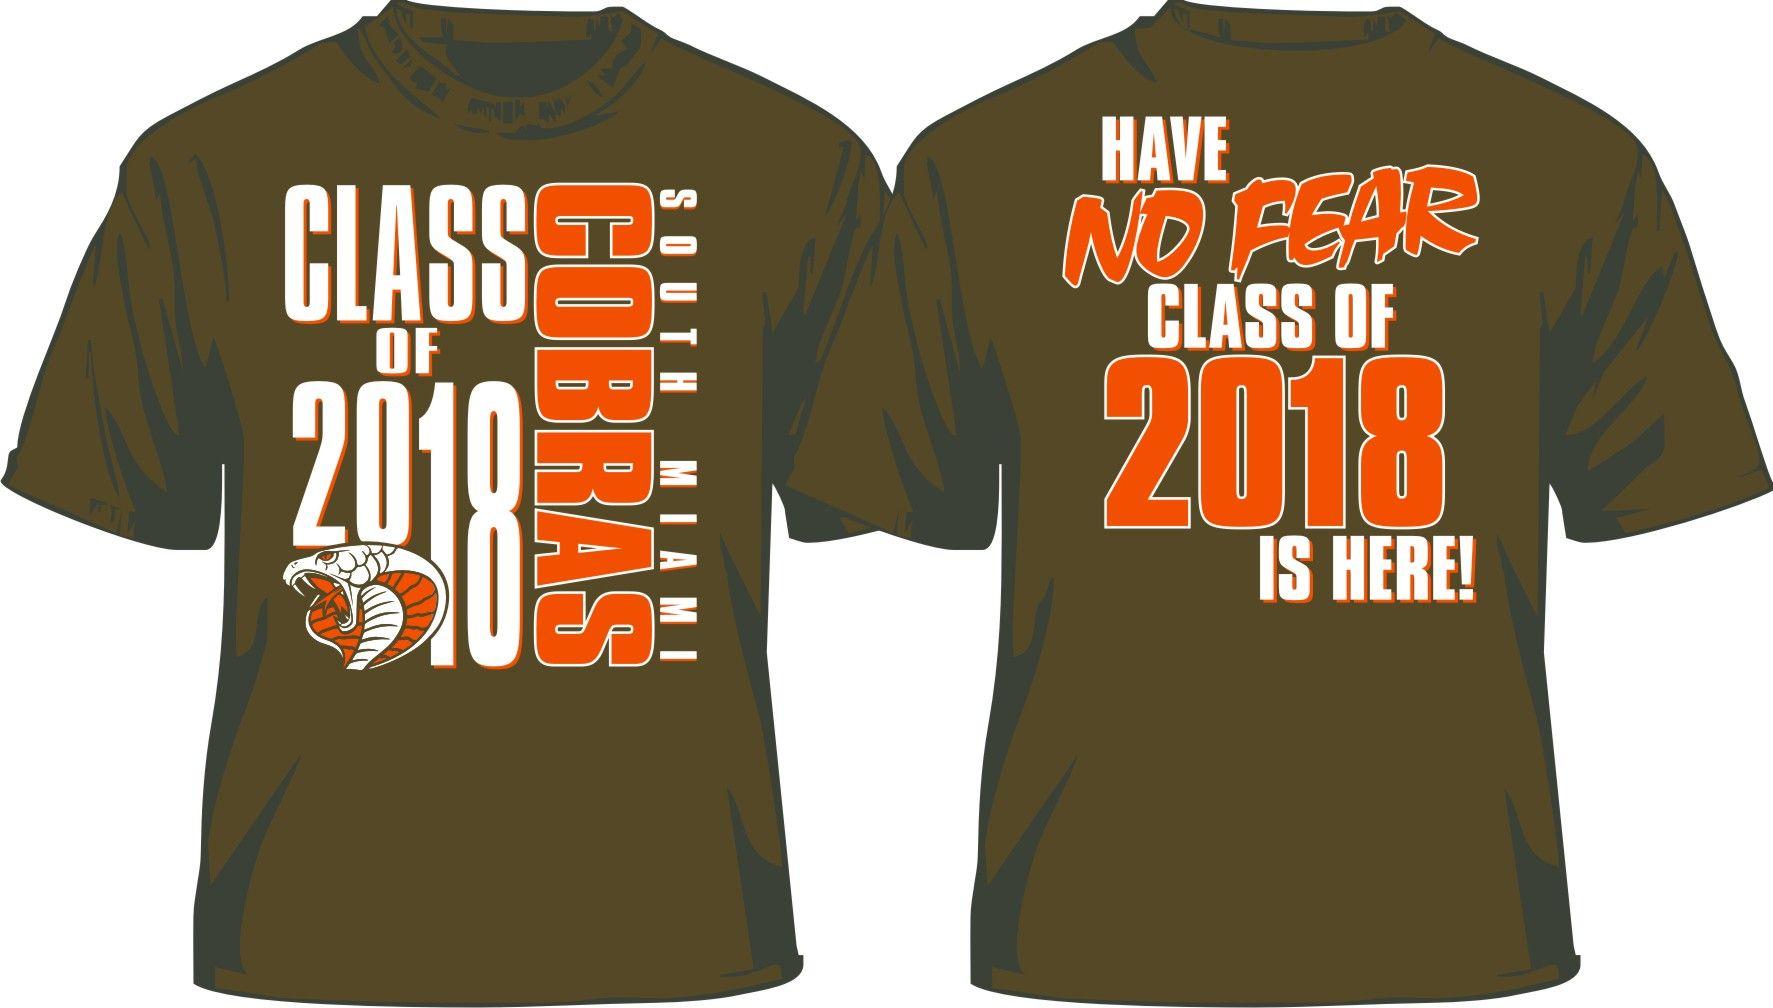 Senior 2021 T shirt Etsy in 2020 Senior class shirts